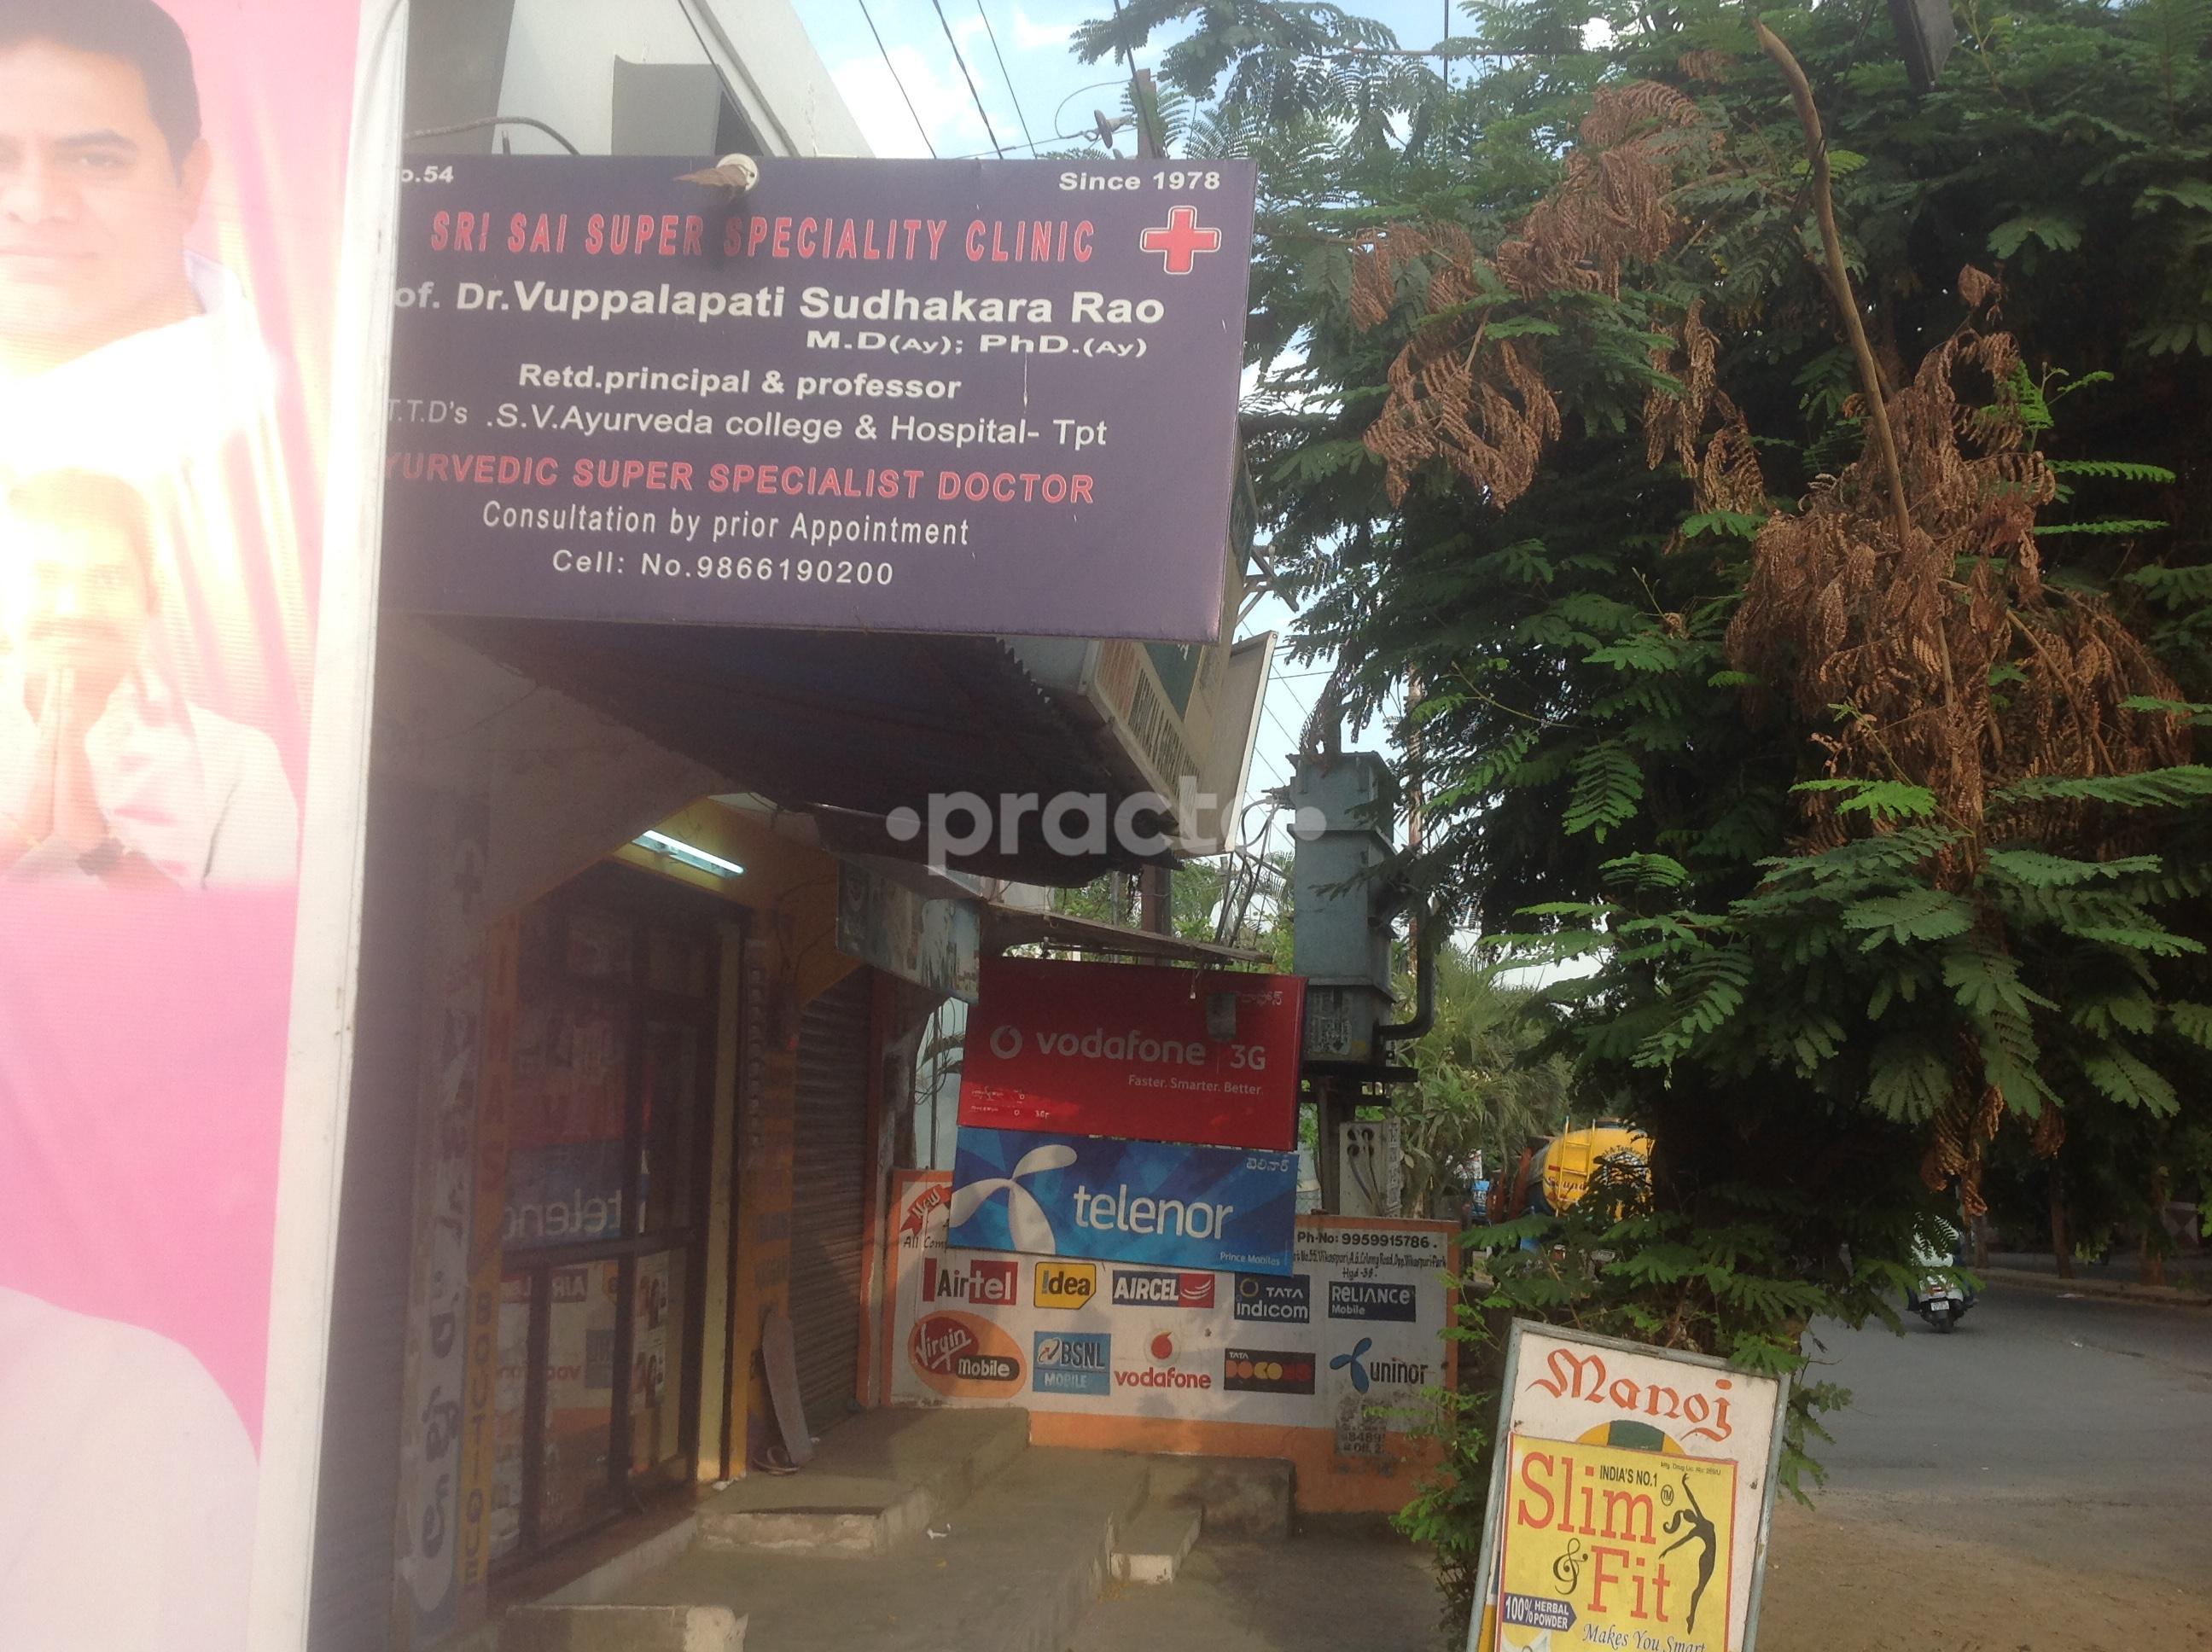 Sri Sai Super Speciality AyurvedicClinic